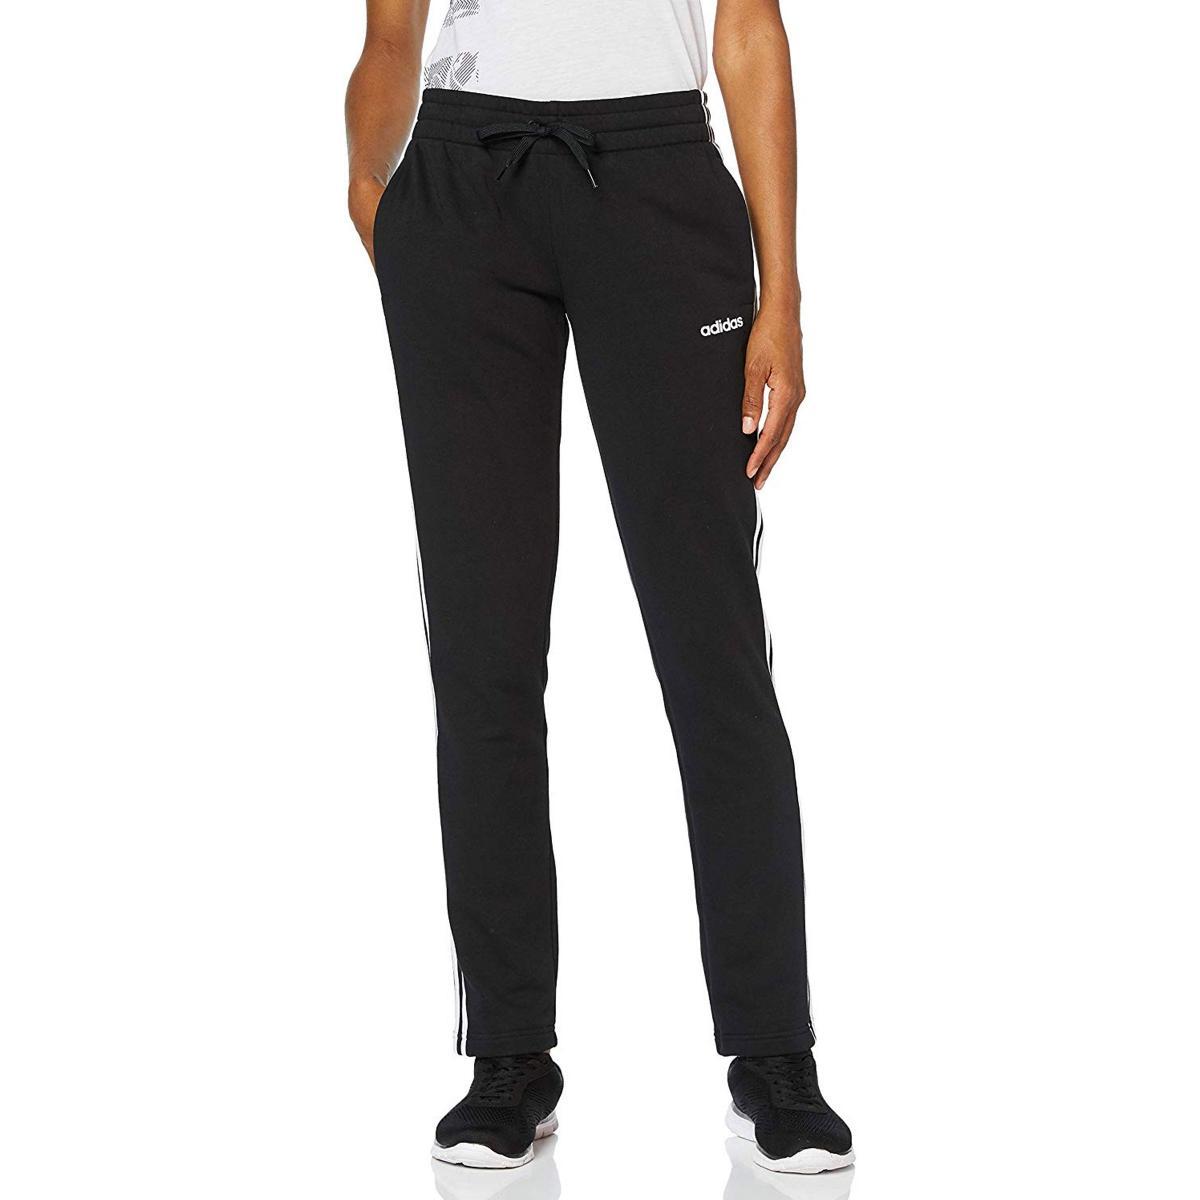 Pantaloni tuta Adidas Essentials 3-Stripes Open Hem Pants da donna rif. DP2373